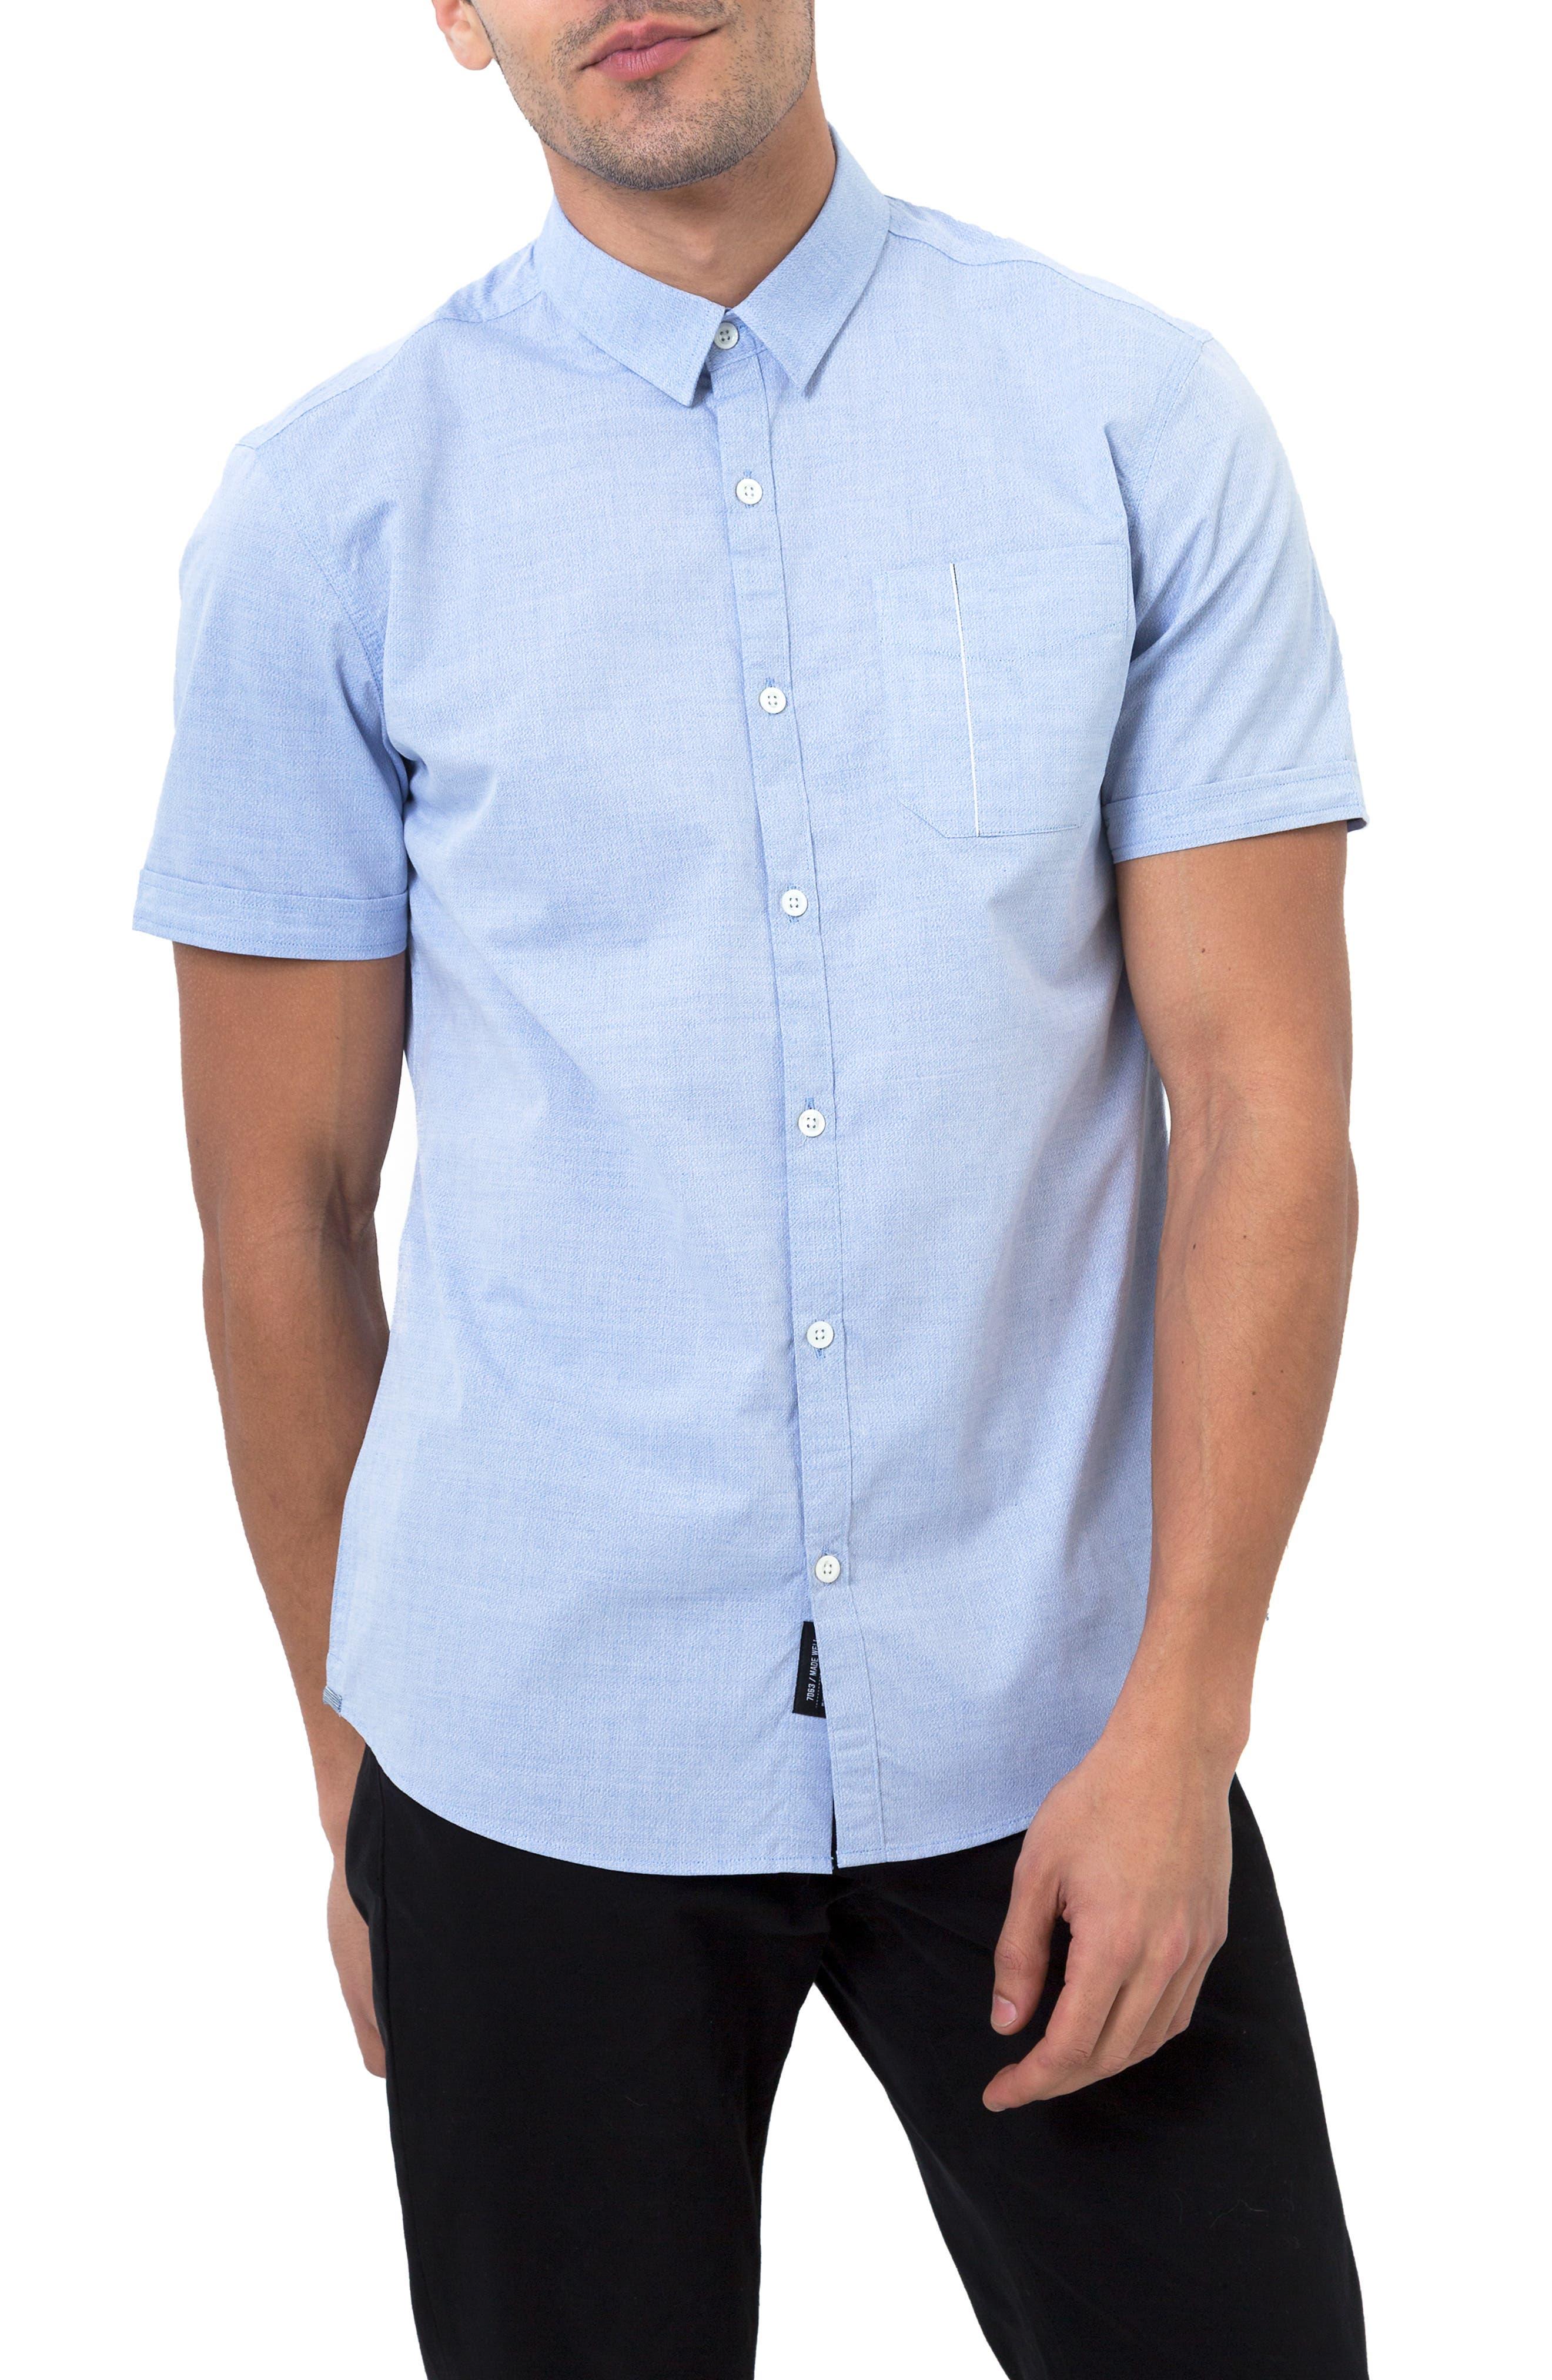 Smile Away Trim Fit Sport Shirt,                         Main,                         color, LIGHT BLUE